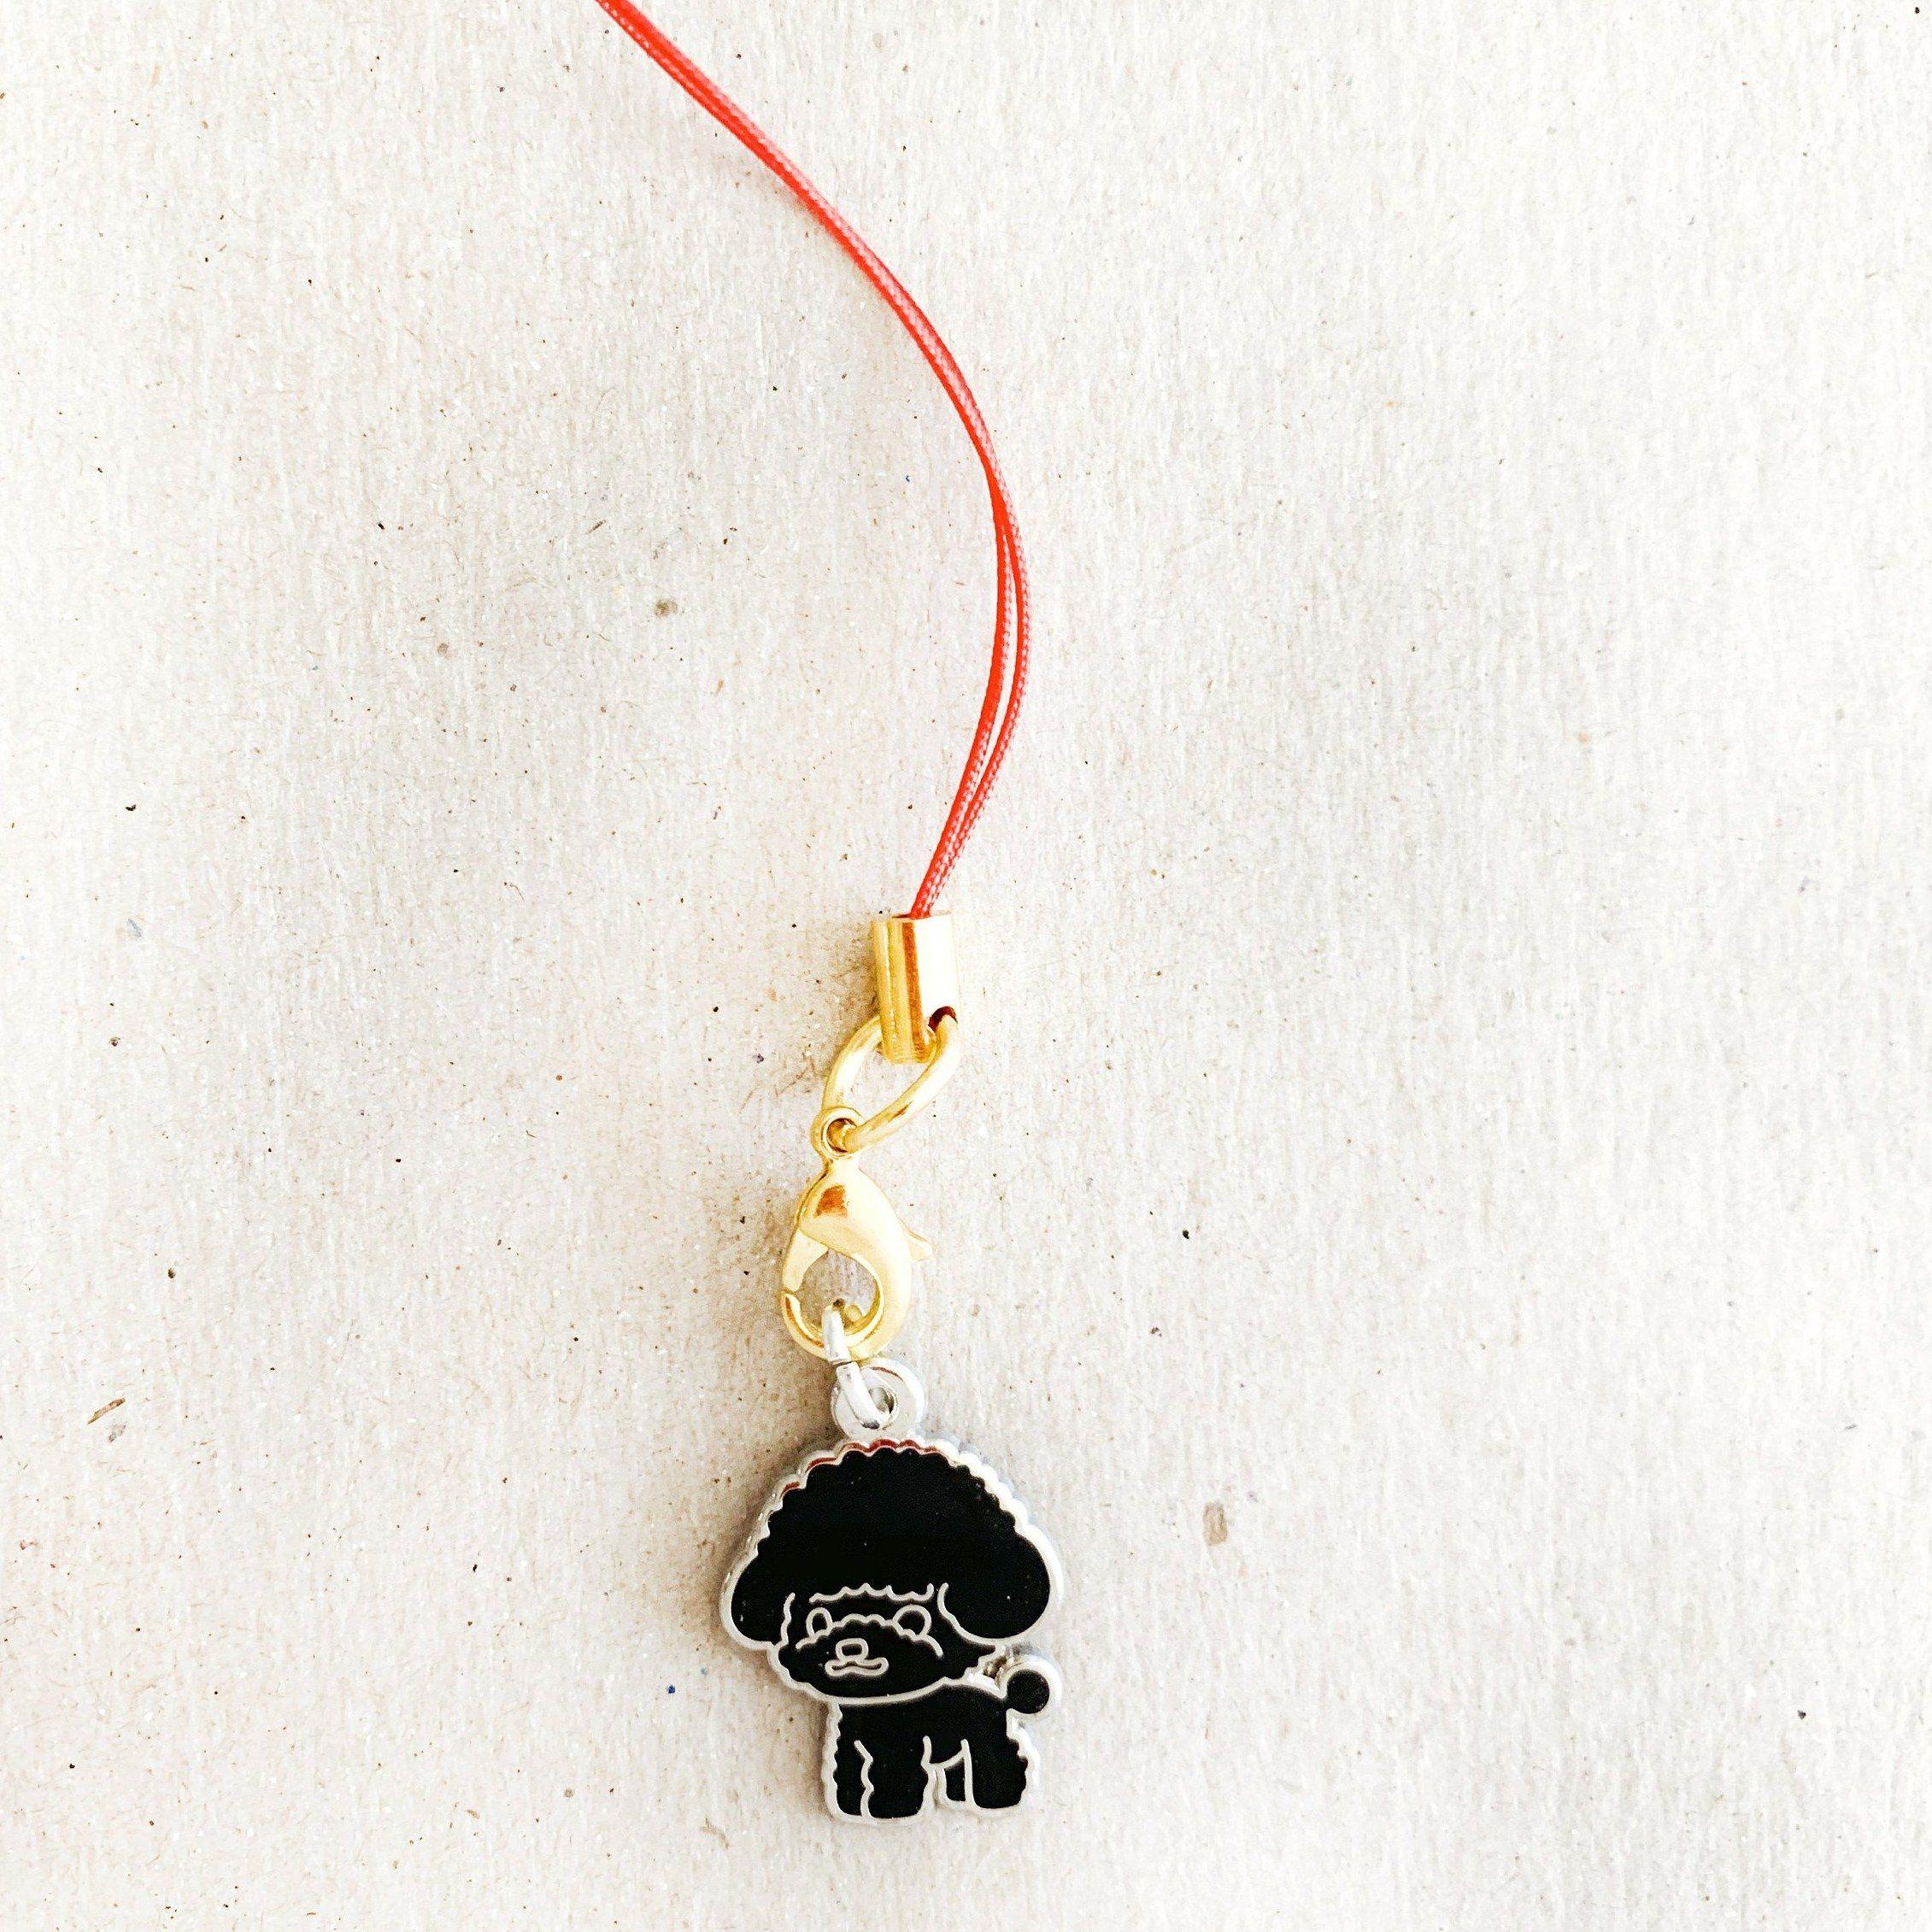 Enamel Charm - Toy Poodle Keychain (Black)